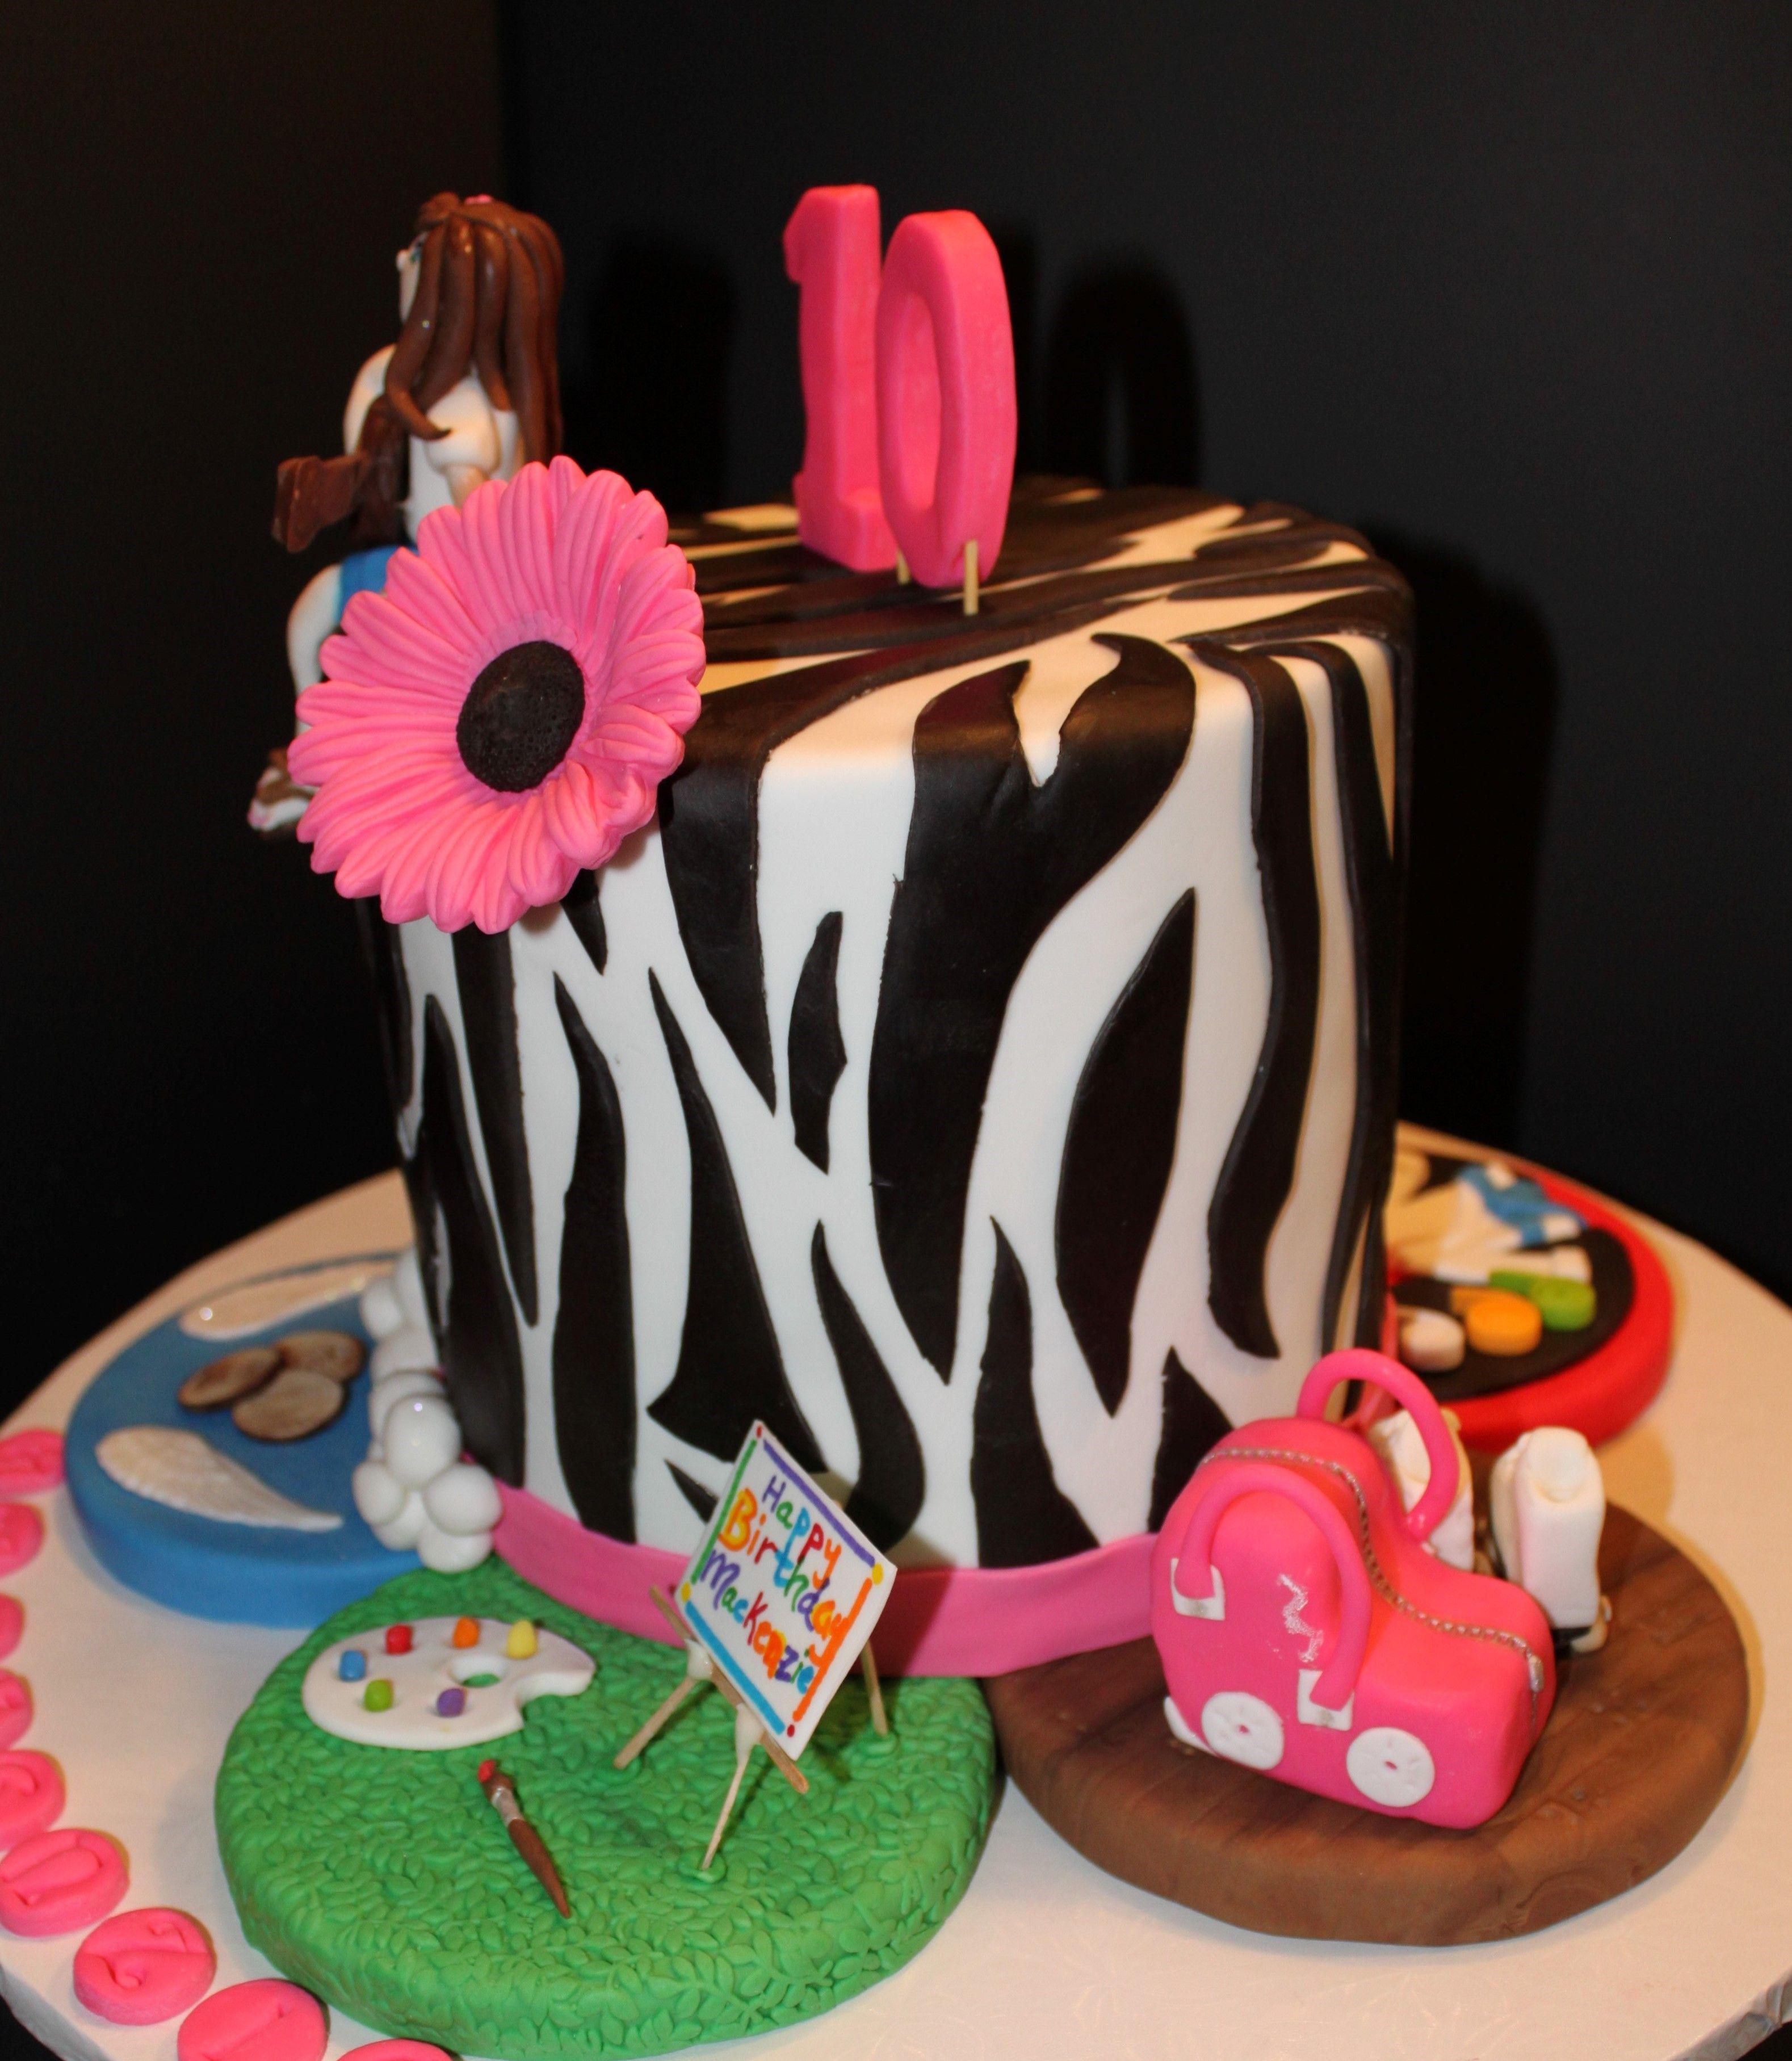 Fondant Zebra Cake Birthday girls favorite things are displayed on